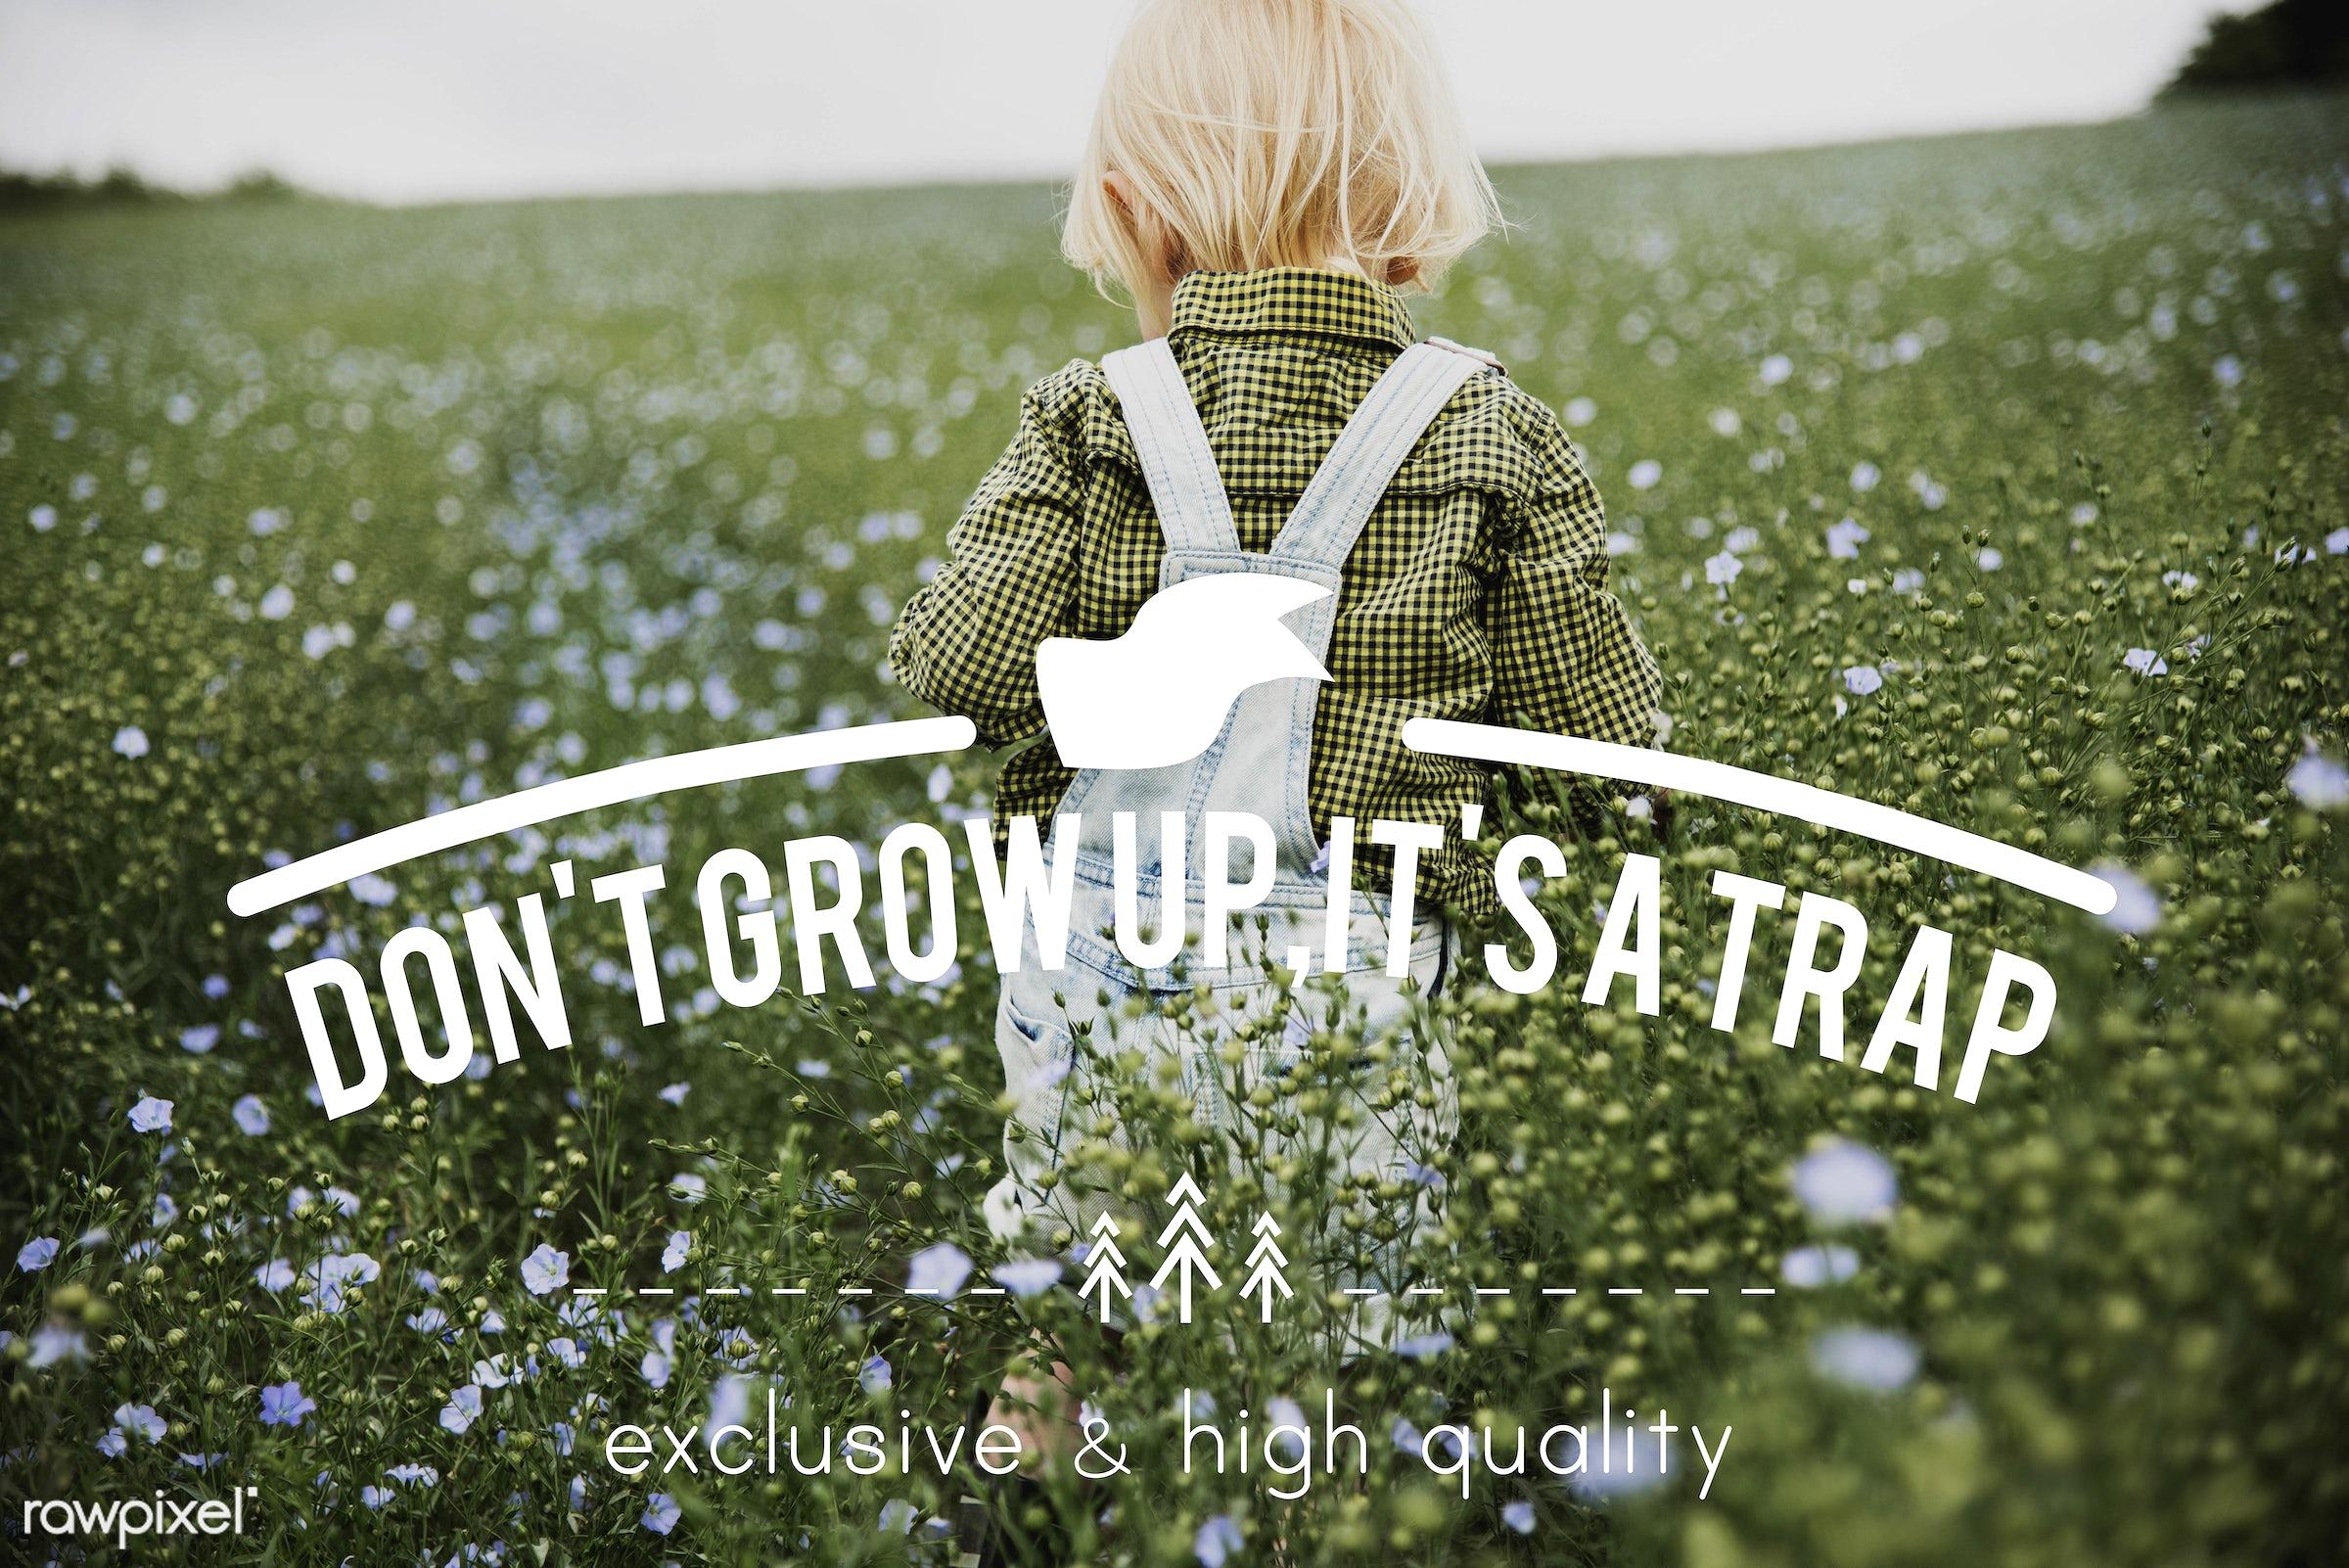 blonde, boy, caucasian, caution, cheeky, childhood, dungarees, encouragement, evolve, flower garden, flowers, funny, garden...